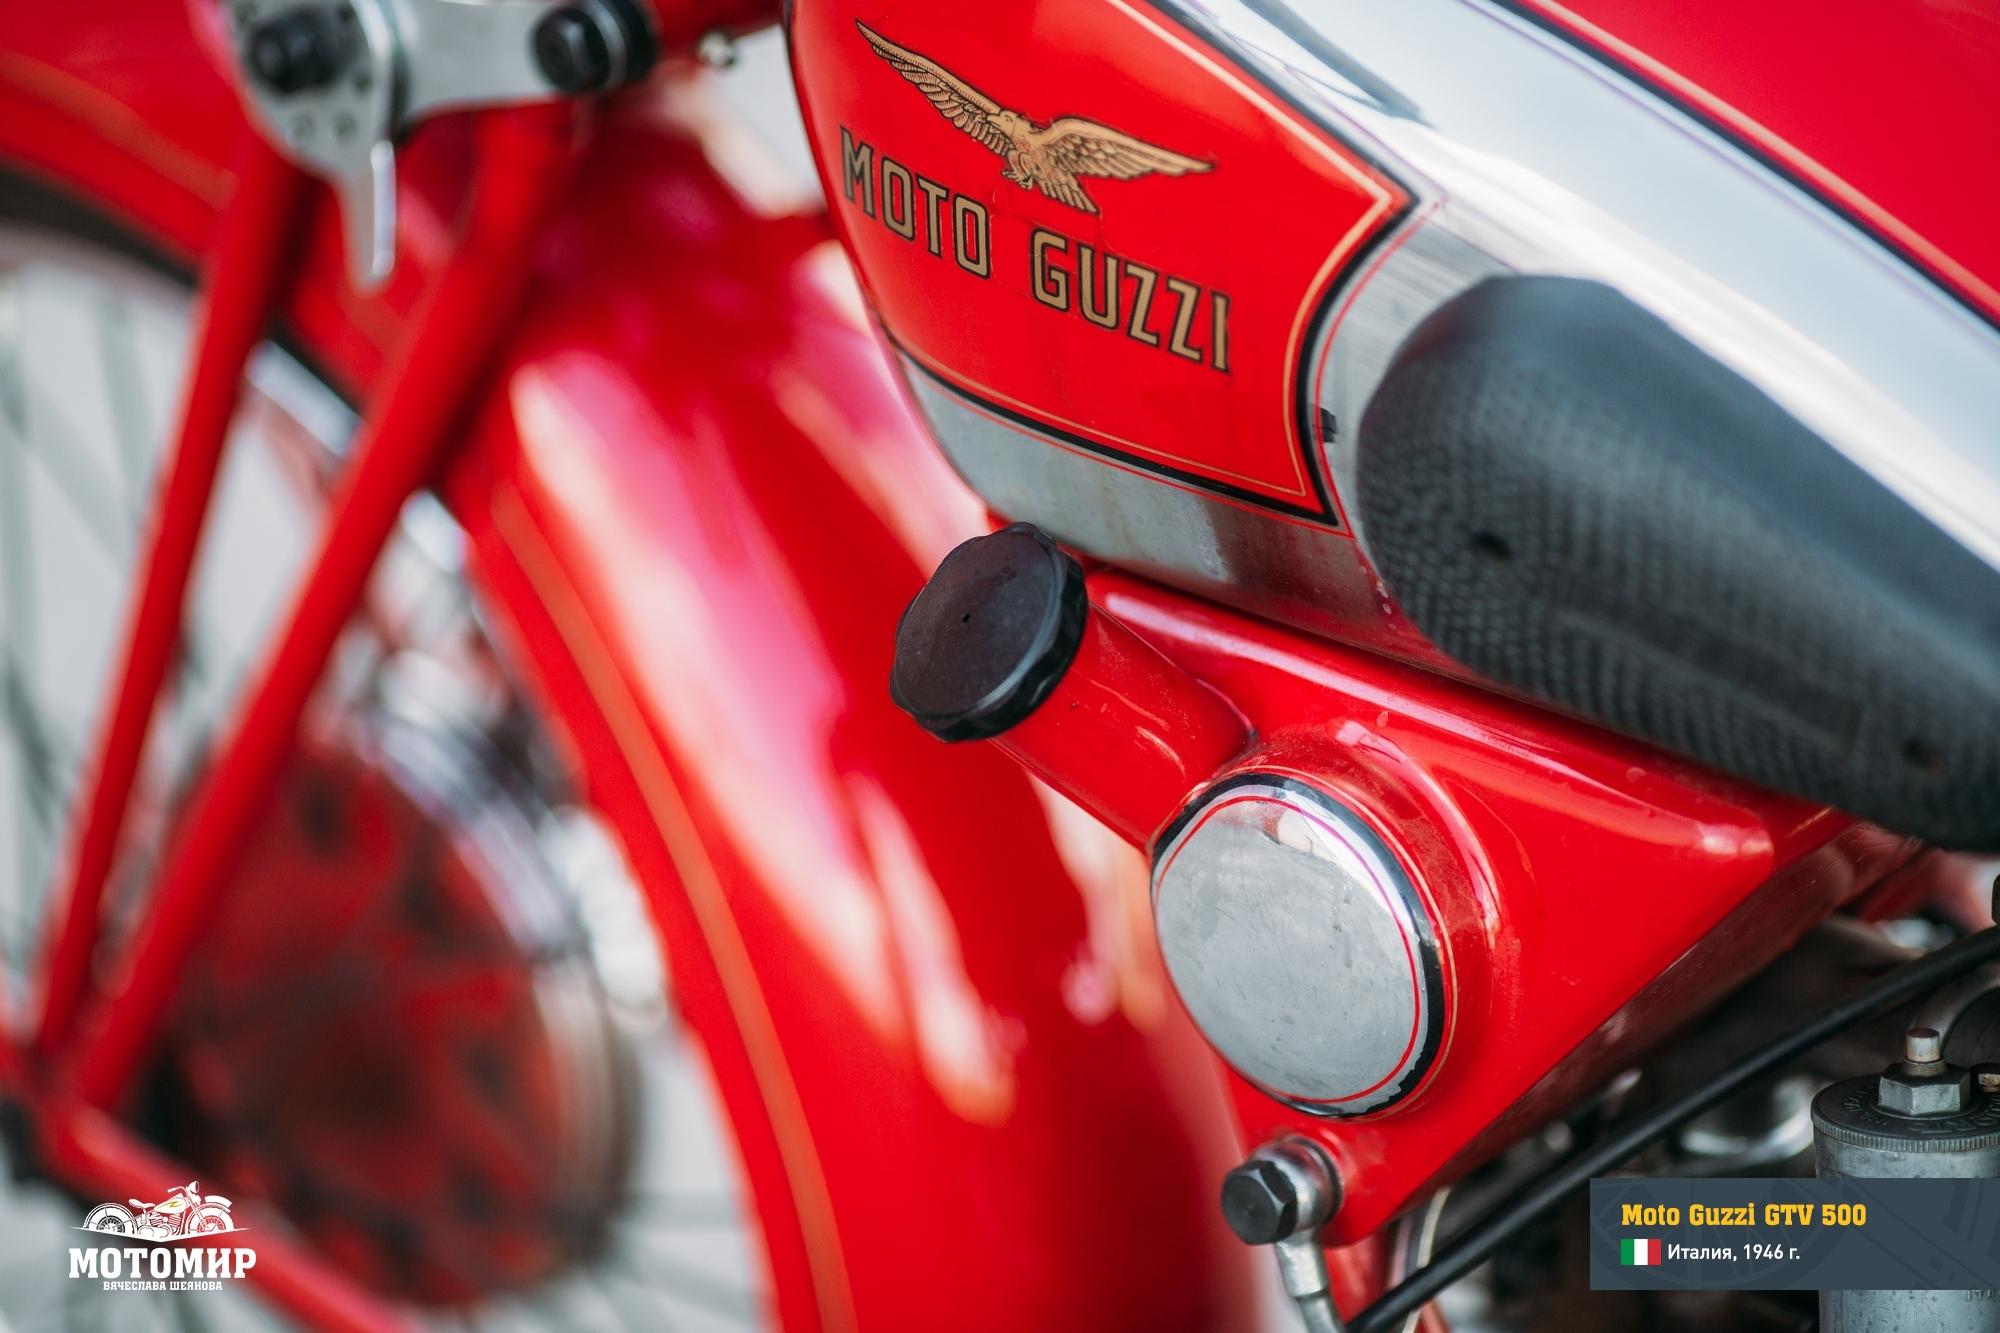 moto-guzzi-gtv-500-201509-web-16